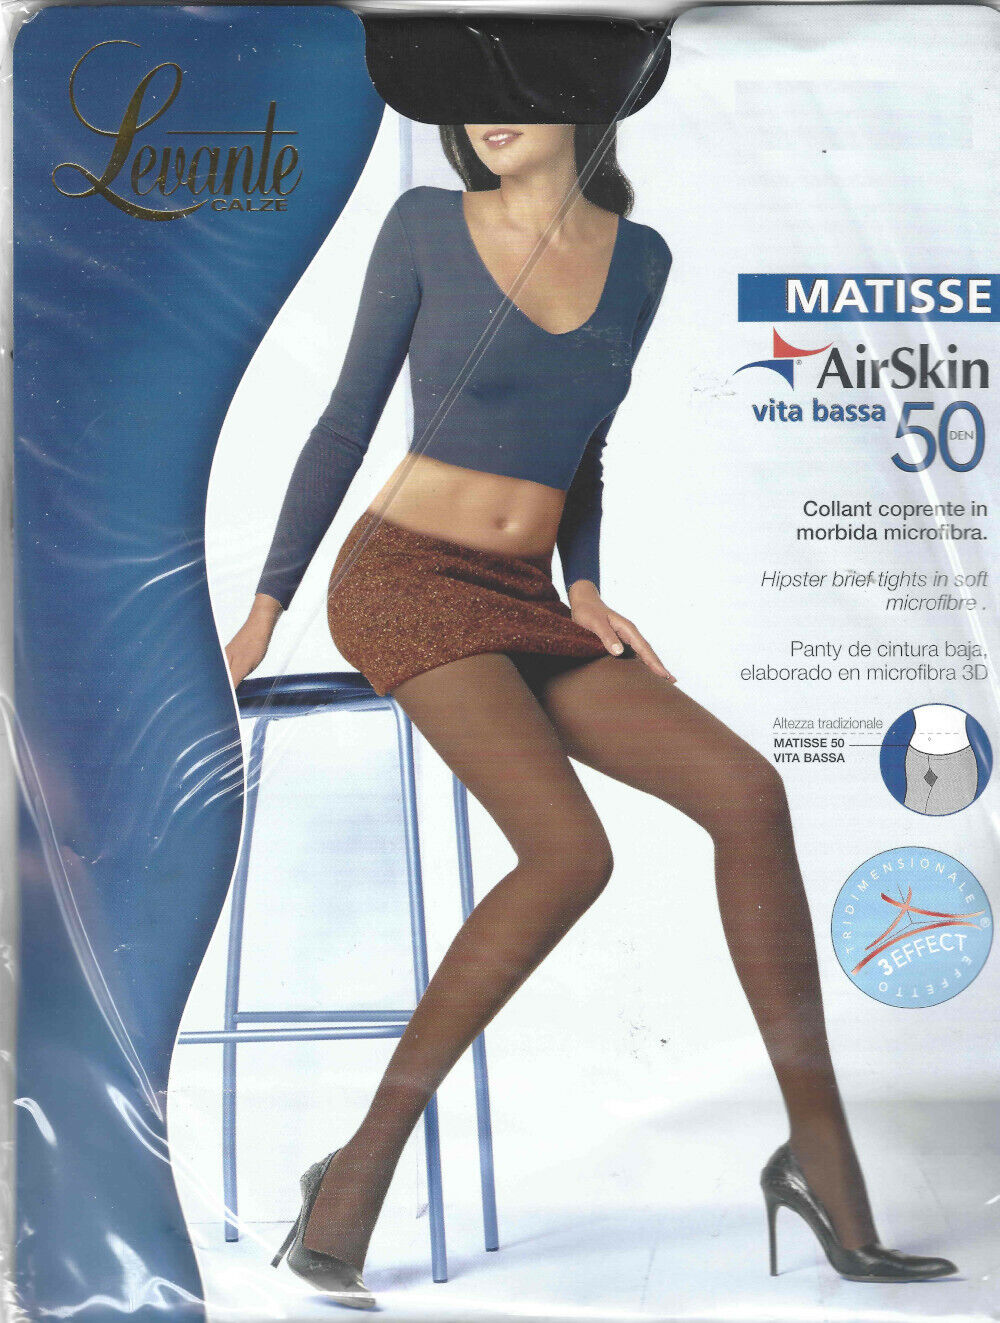 Levante Collant Donna Matisse 150 DEN AirSkin Calze Morbido in microfibra